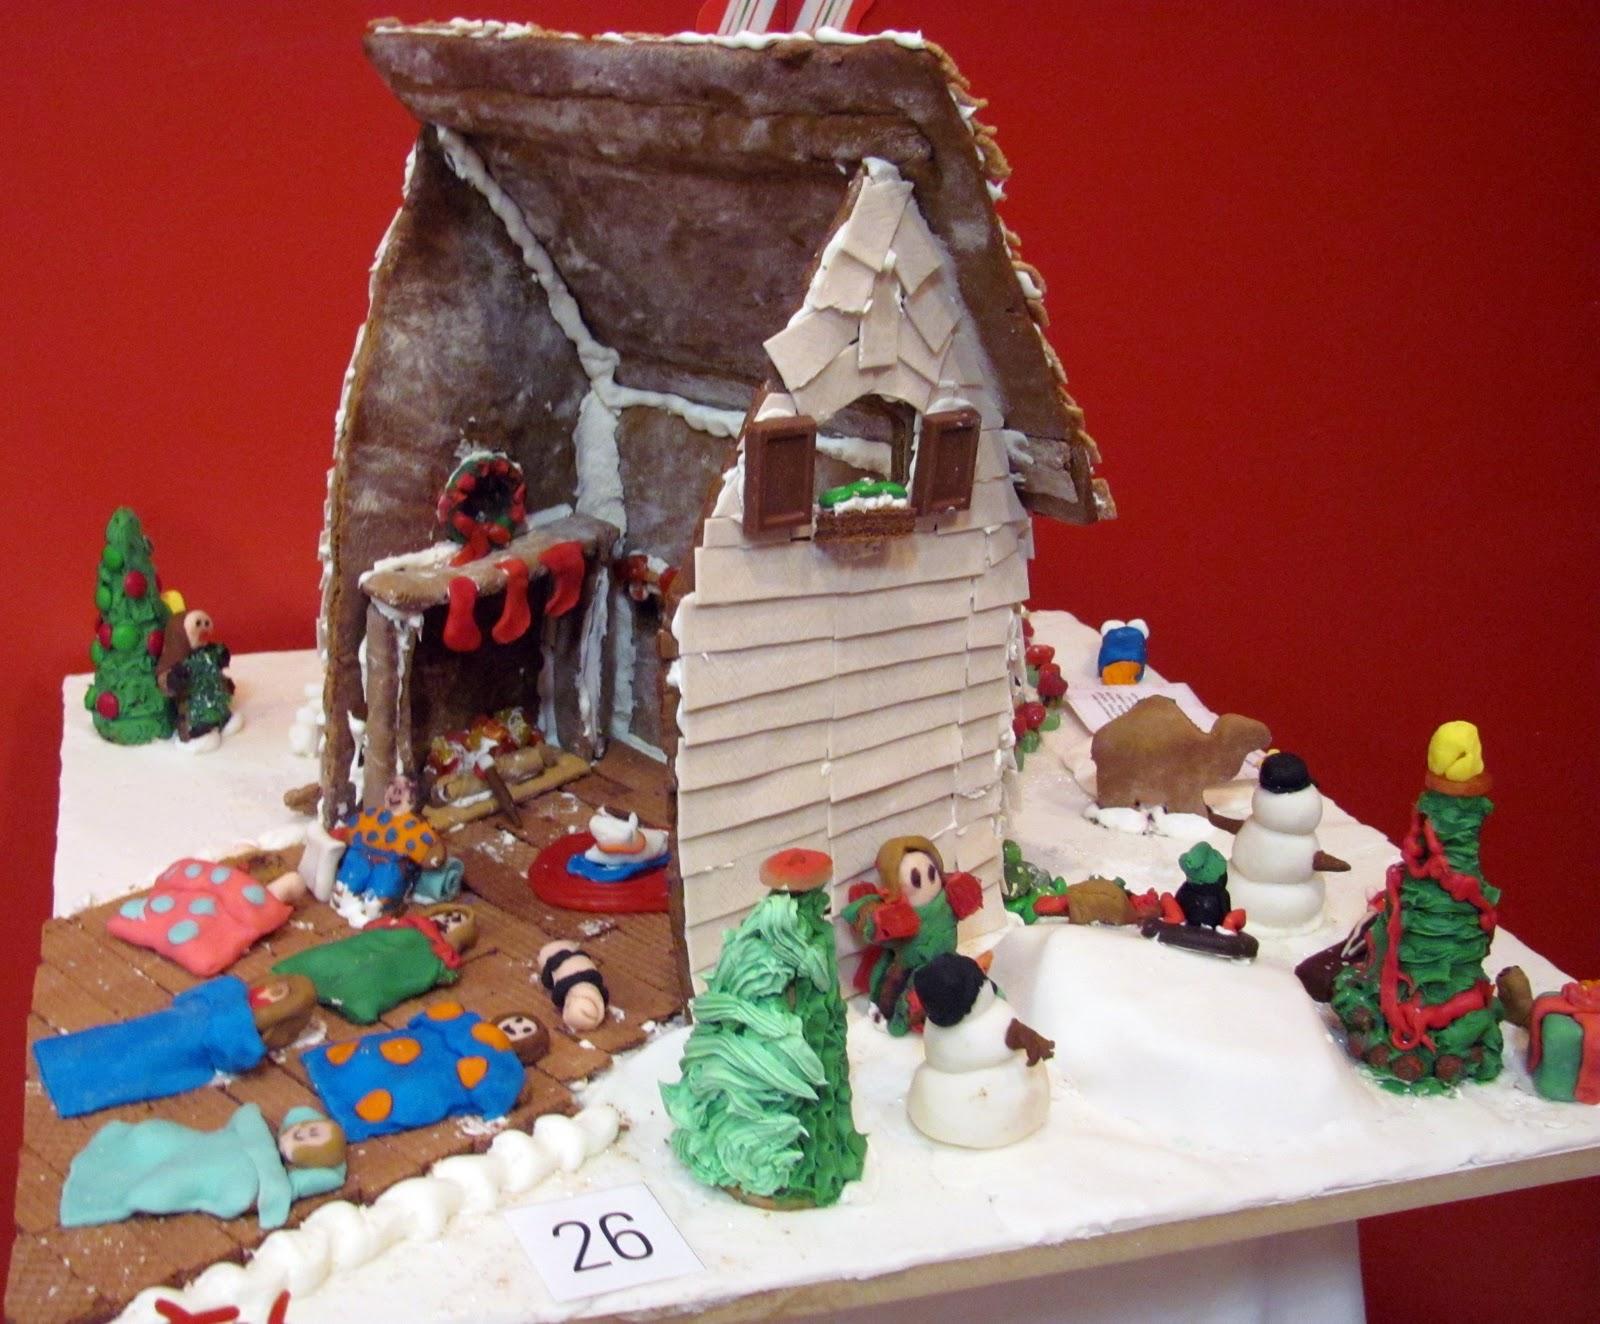 Creating nirvana gingerbread house inspiration for Gingerbread house inspiration